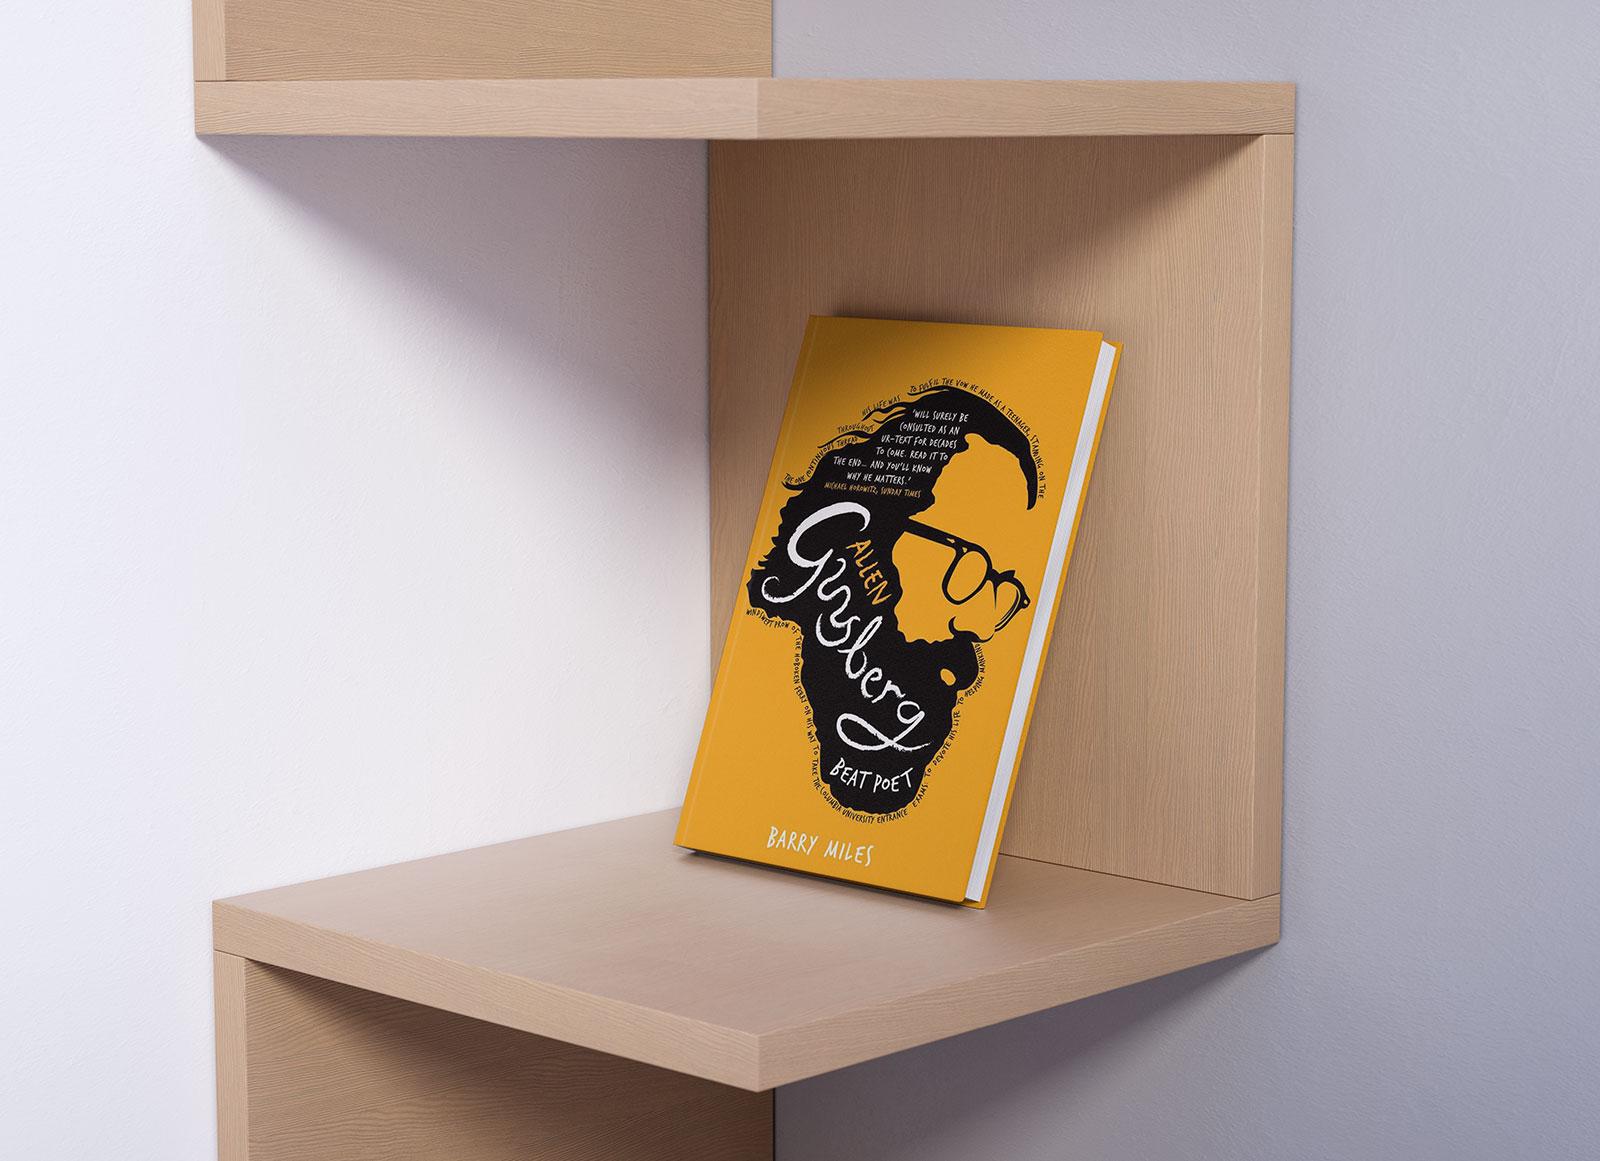 Free-Book-on-Shelf-Mockup-PSD